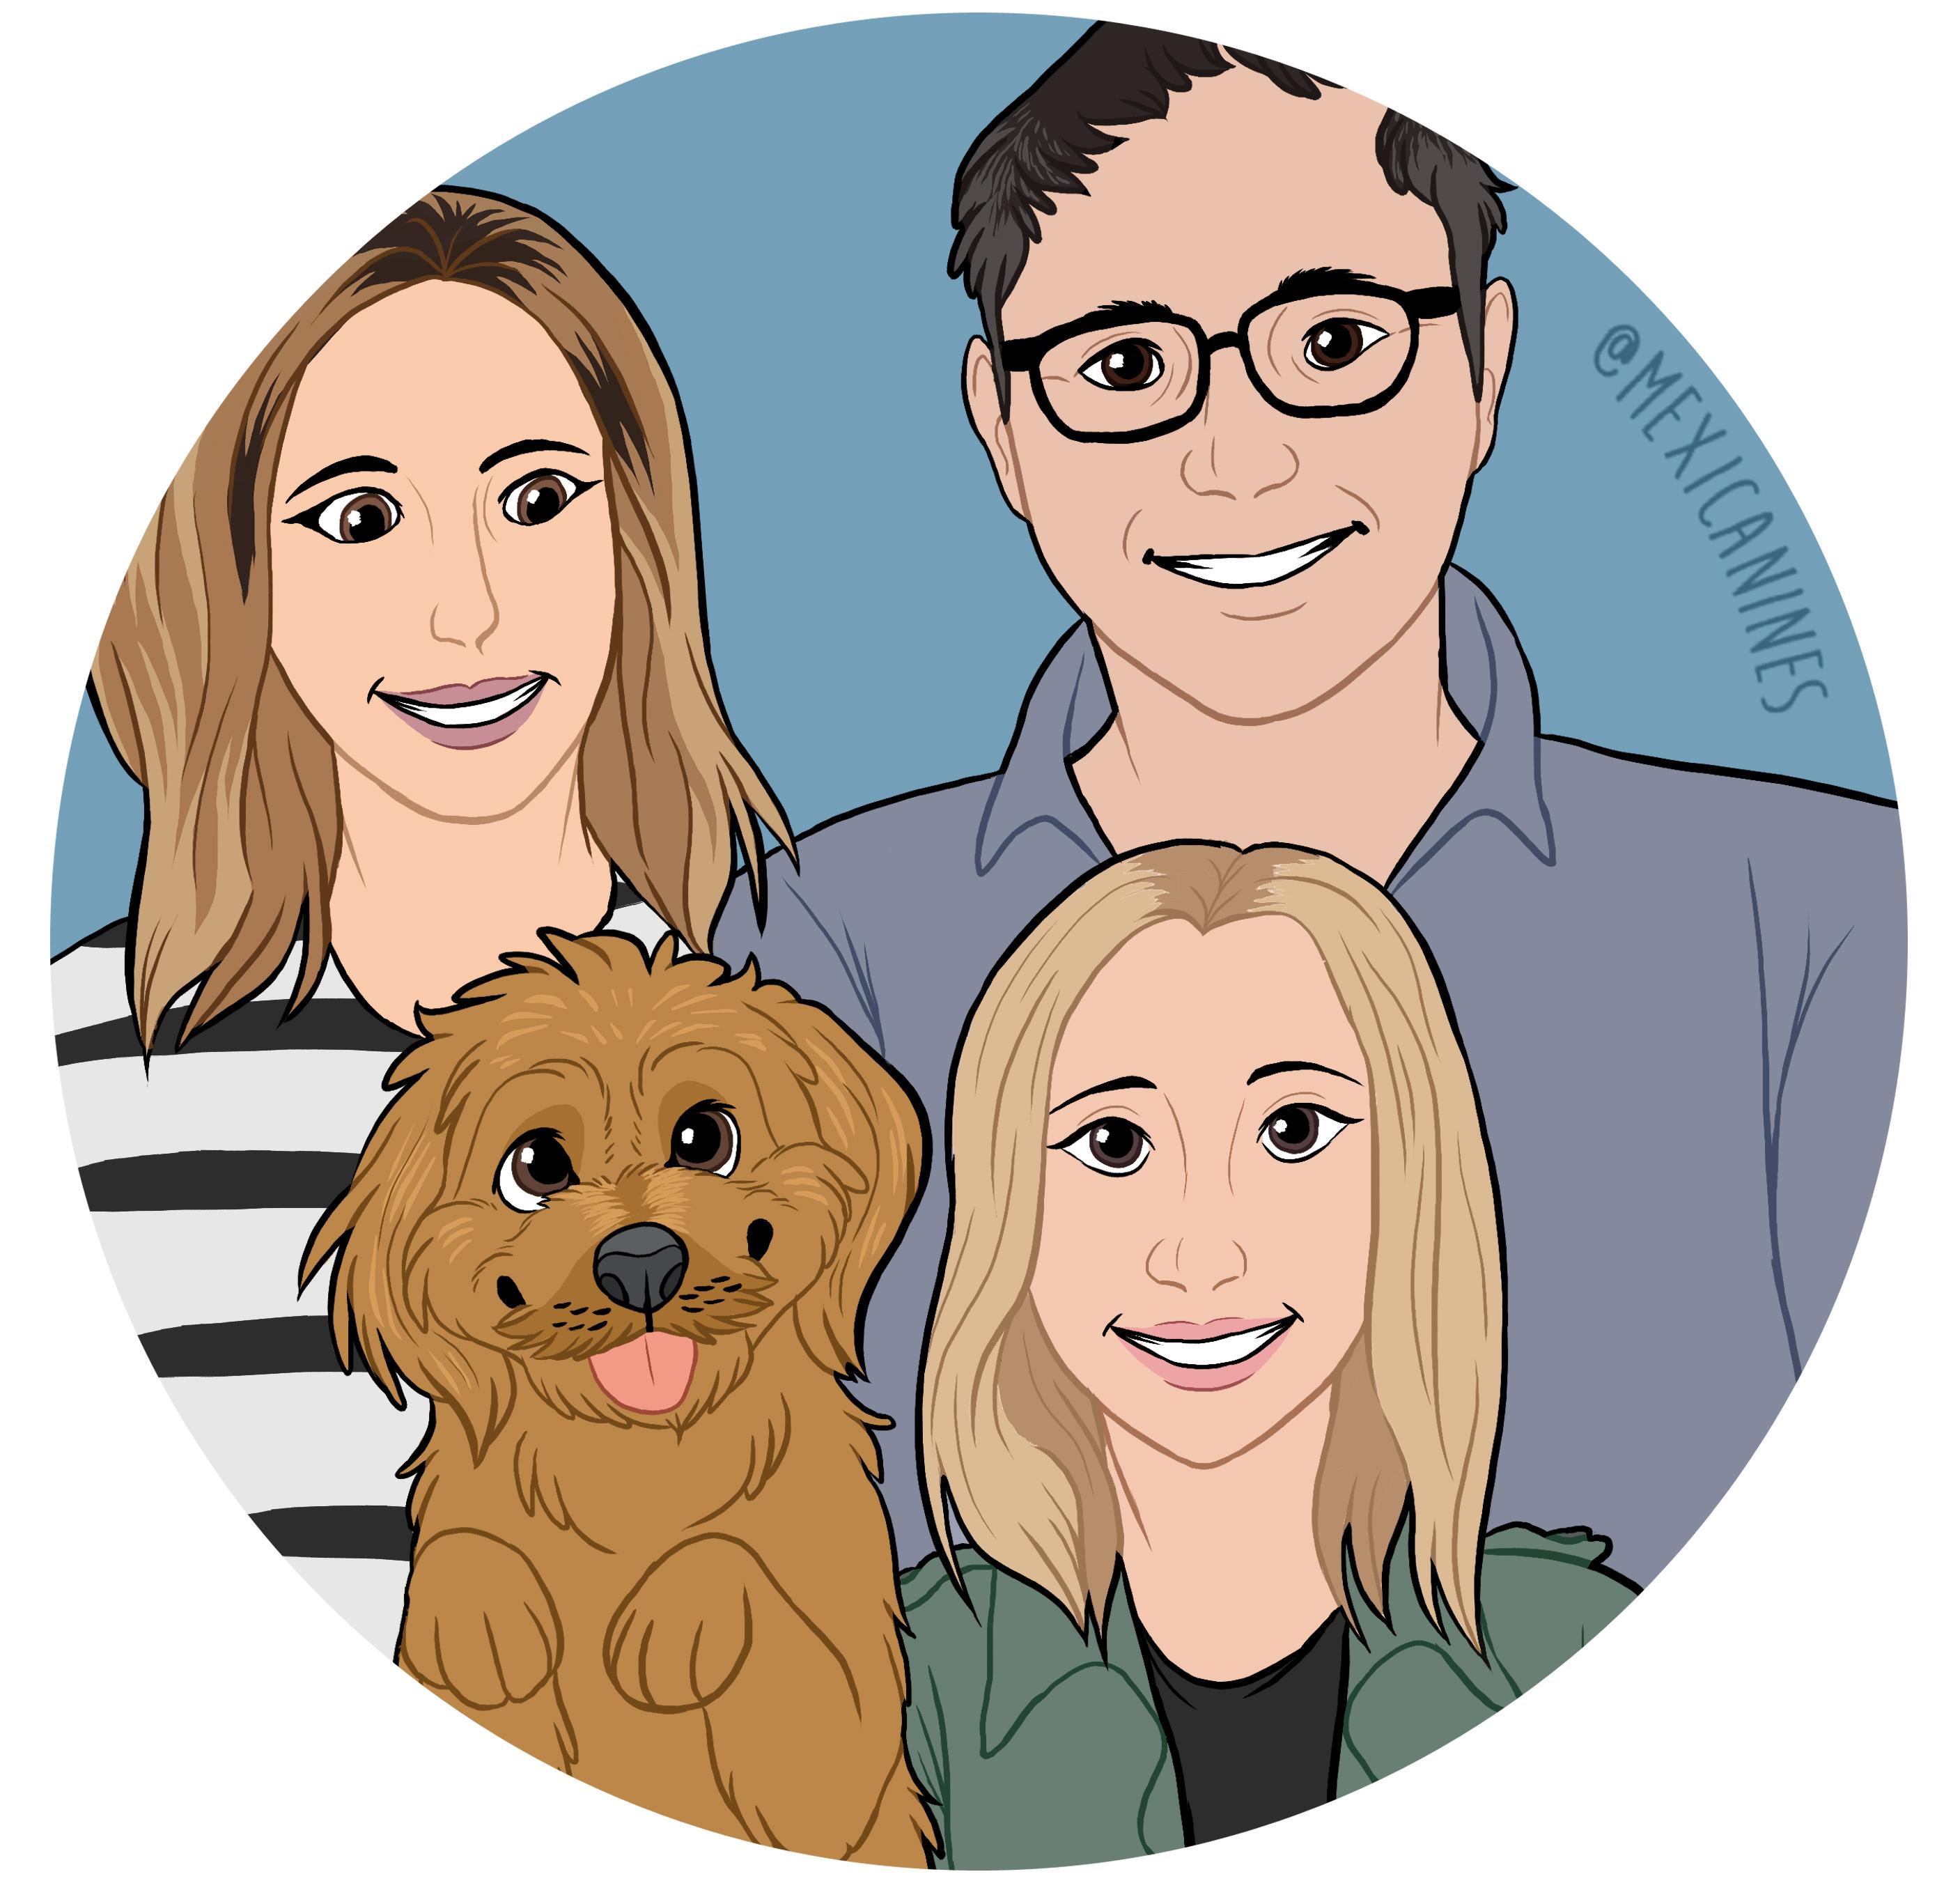 bella's family